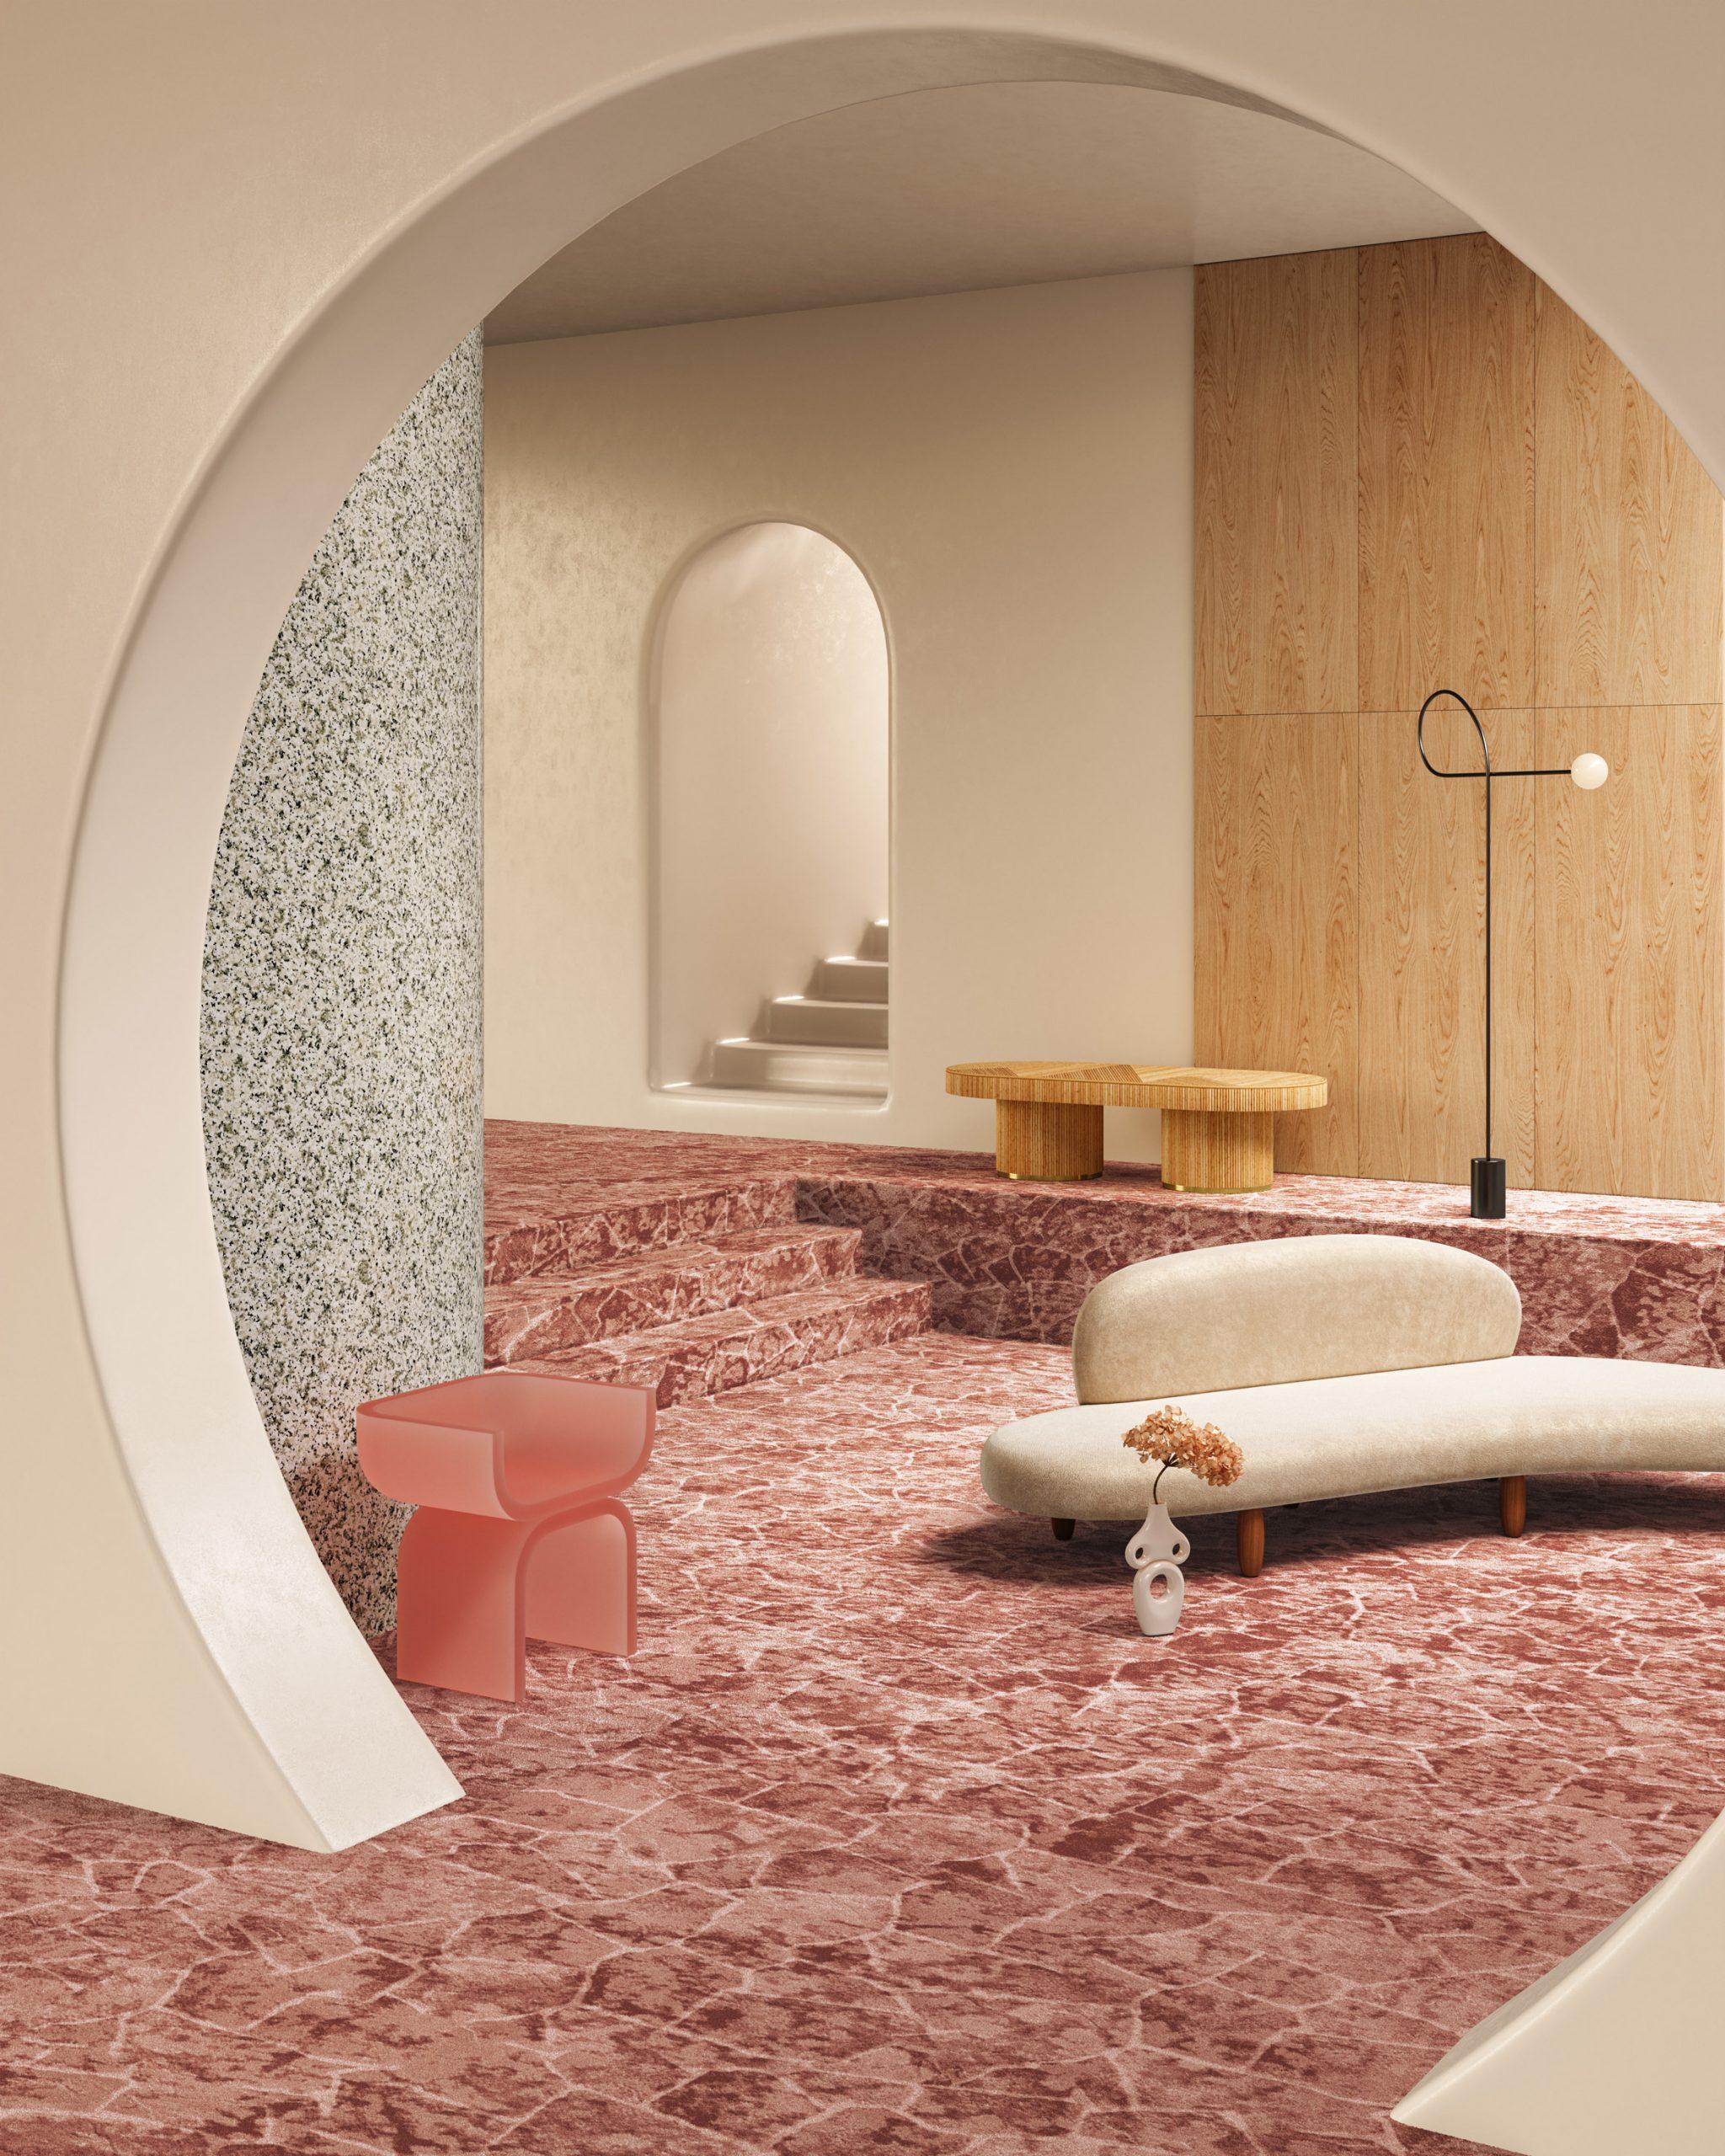 Tsar rust-coloured carpet in a minimal contemporary room